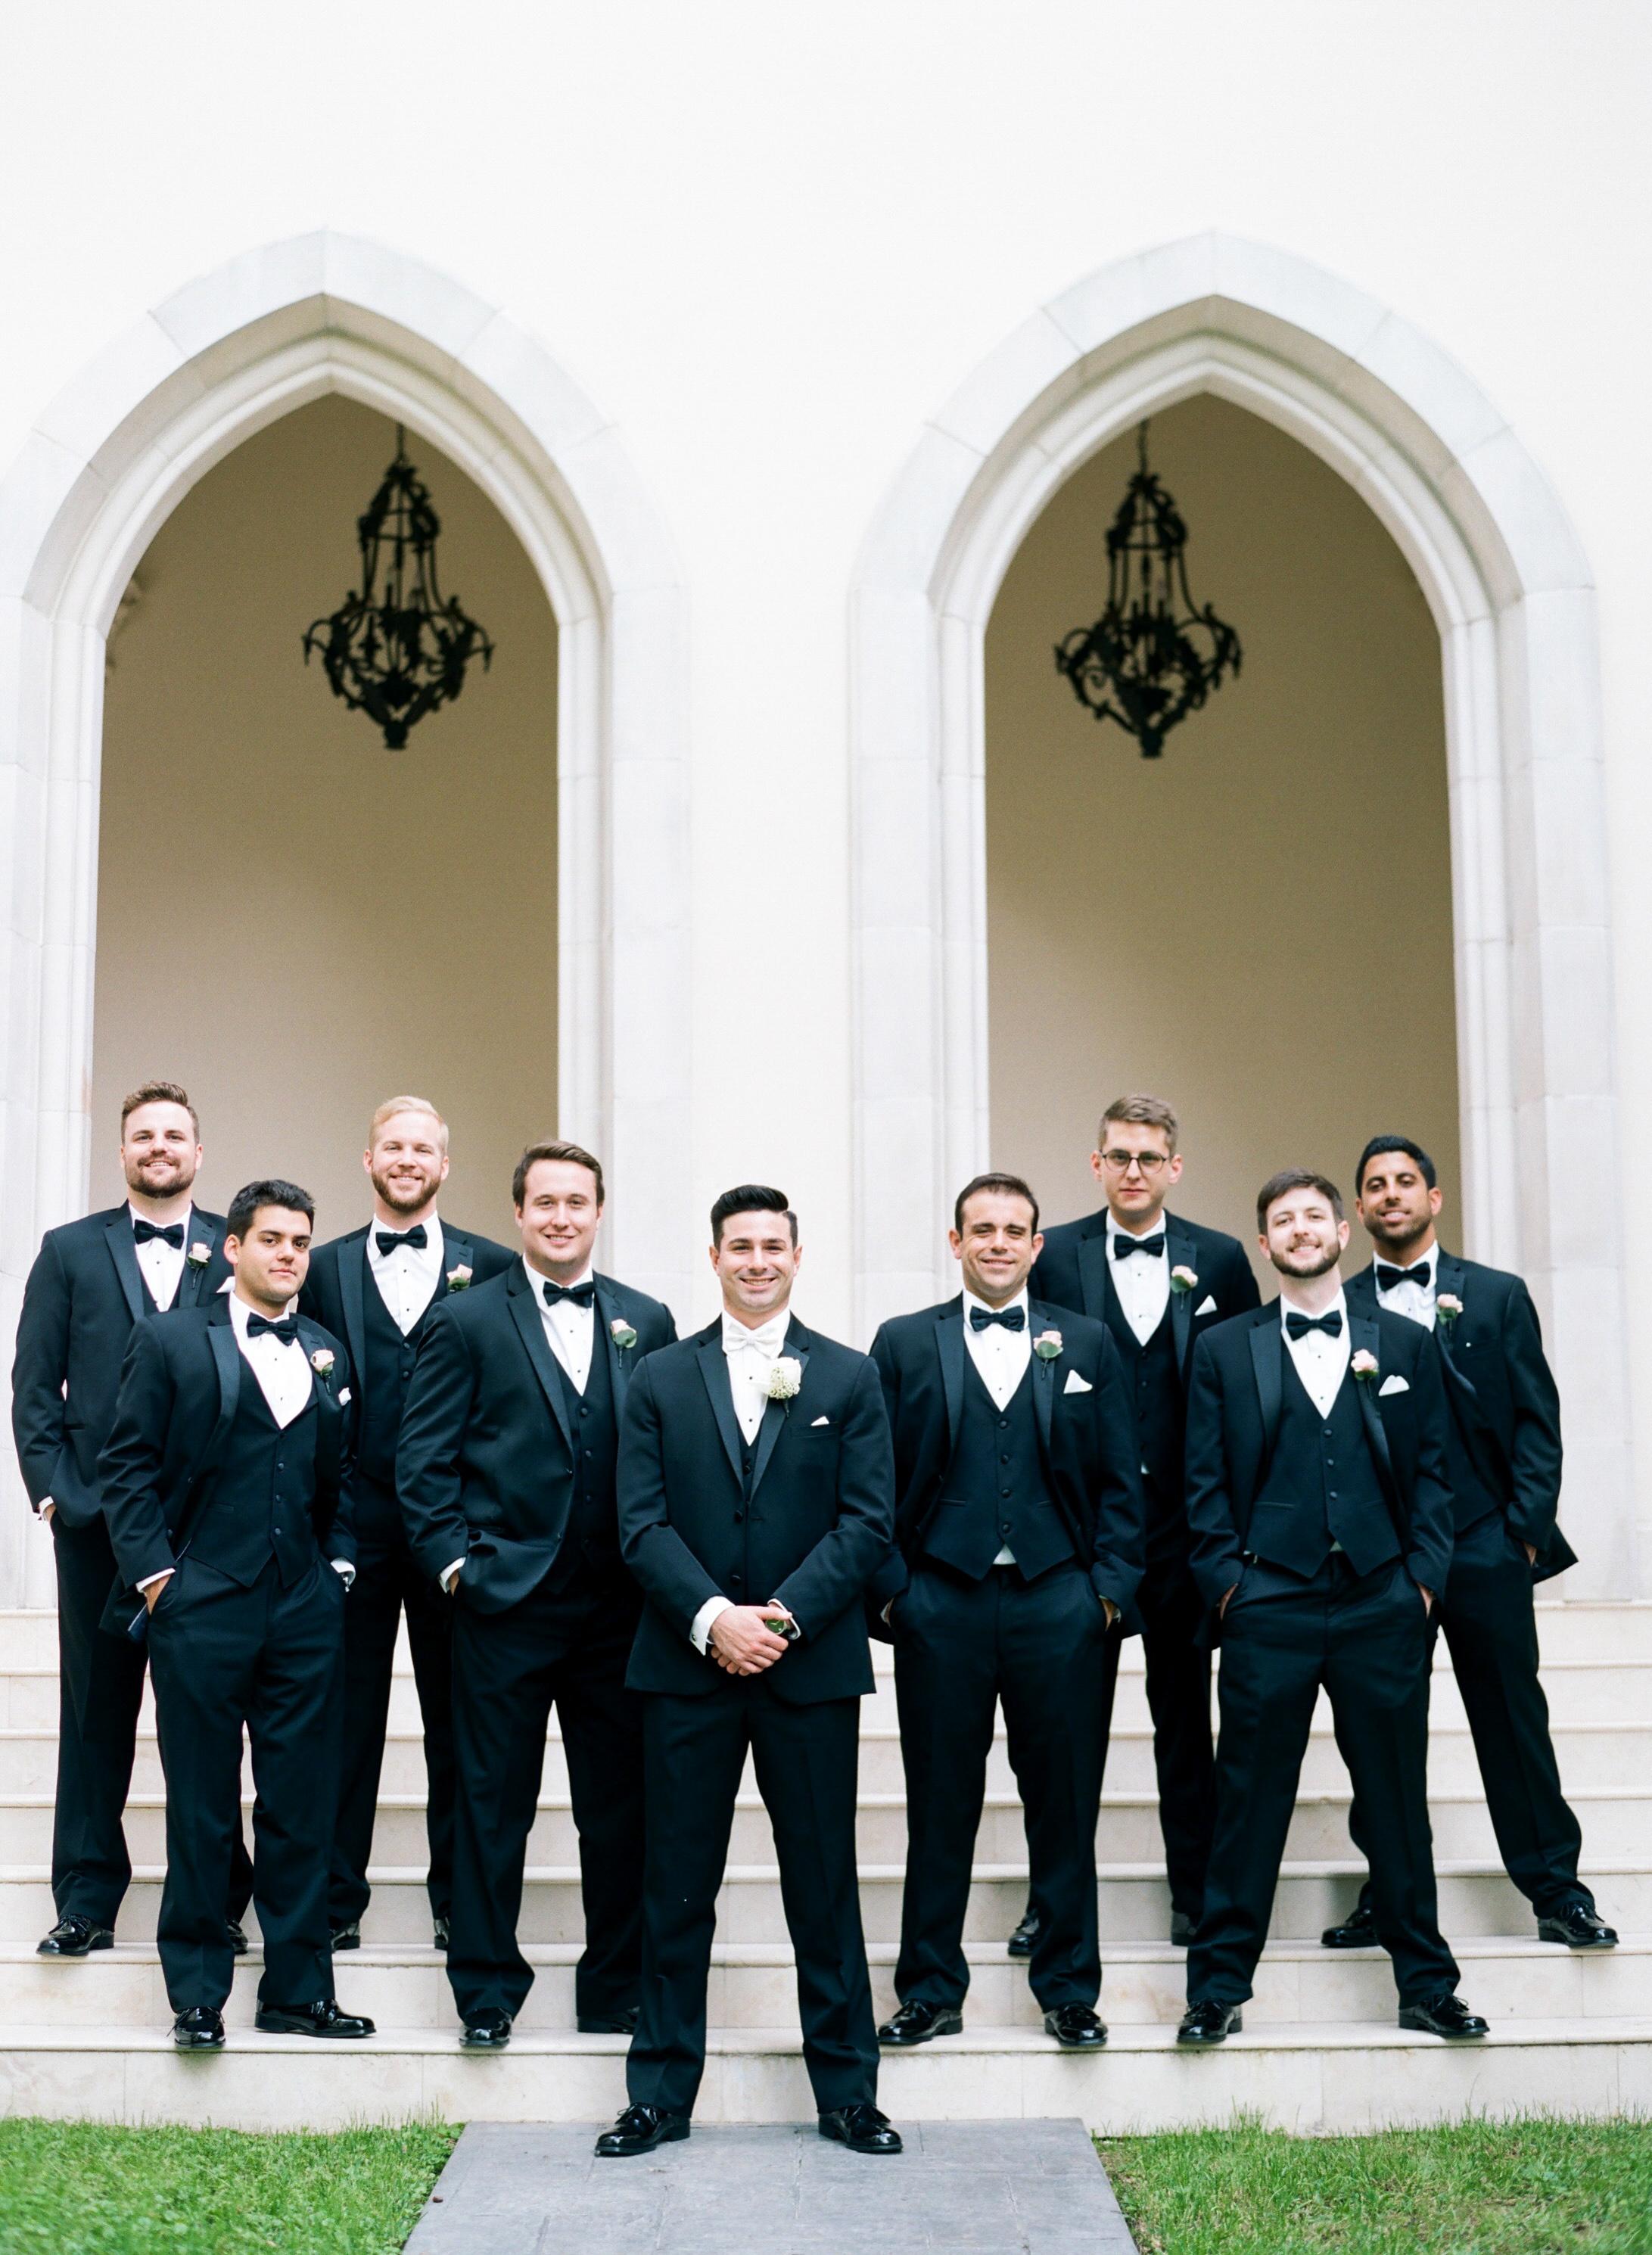 Dana-Fernandez-Photography-Houston-Wedding-Photographer-Style-Me-Pretty-Film-Texas-Destination-Photographer-29.jpg